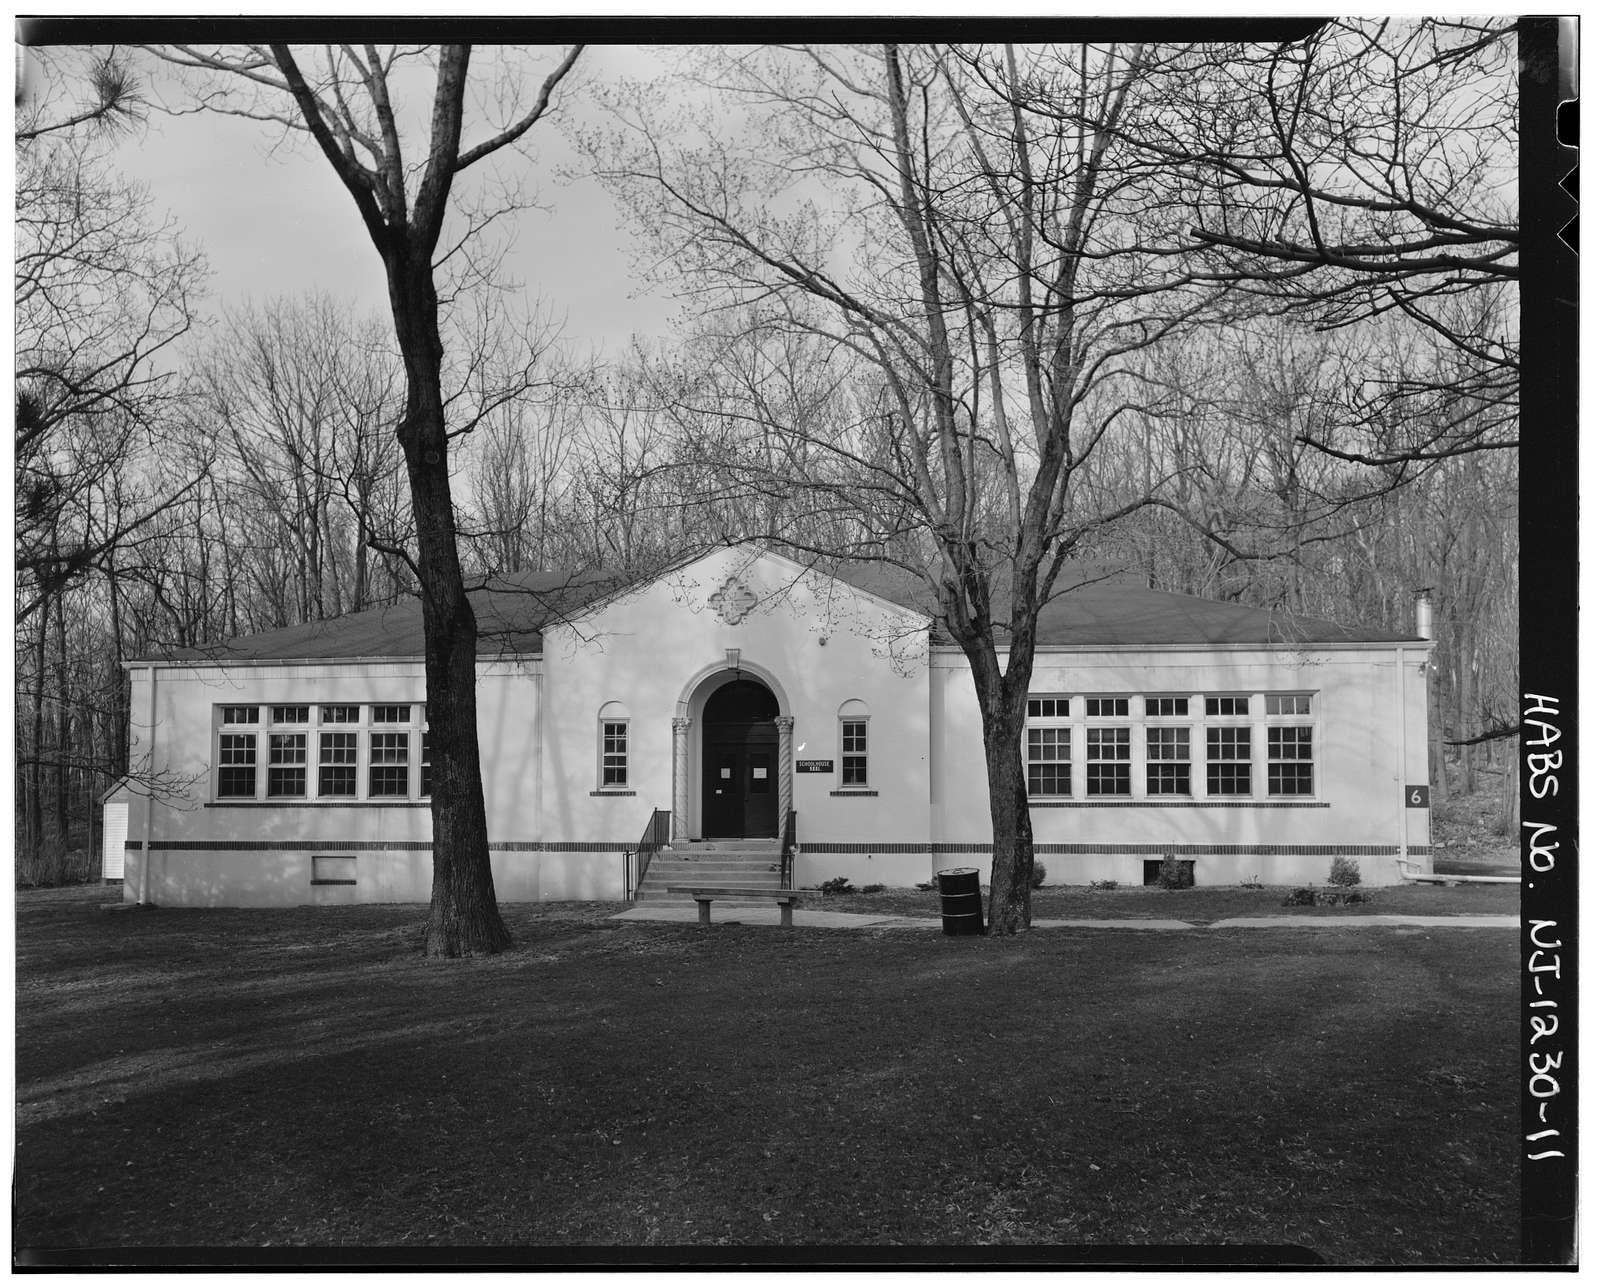 New Jersey State Tuberculosis Sanatorium, Sanatorium Road, 1 mile east of intersection of Main Street & Sanitorium Road, Glen Gardner, Hunterdon County, NJ